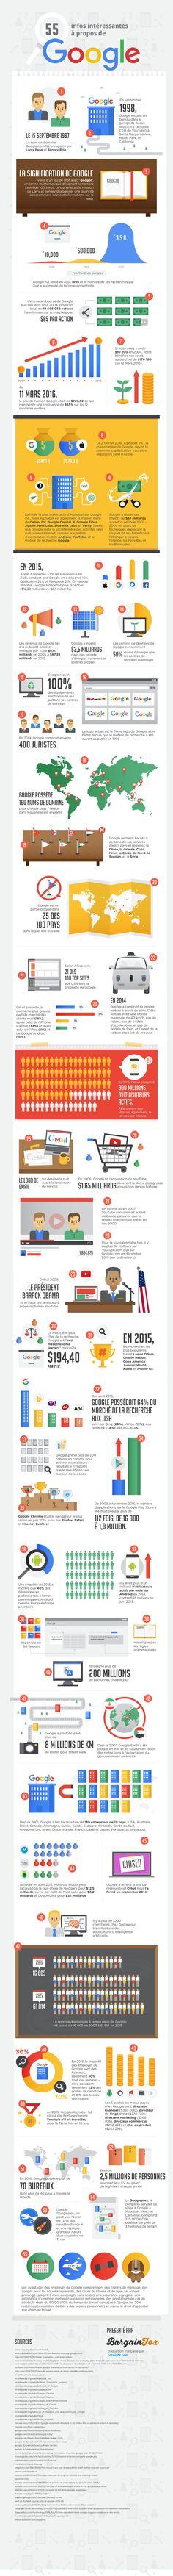 Infographie infos intéressantes Google